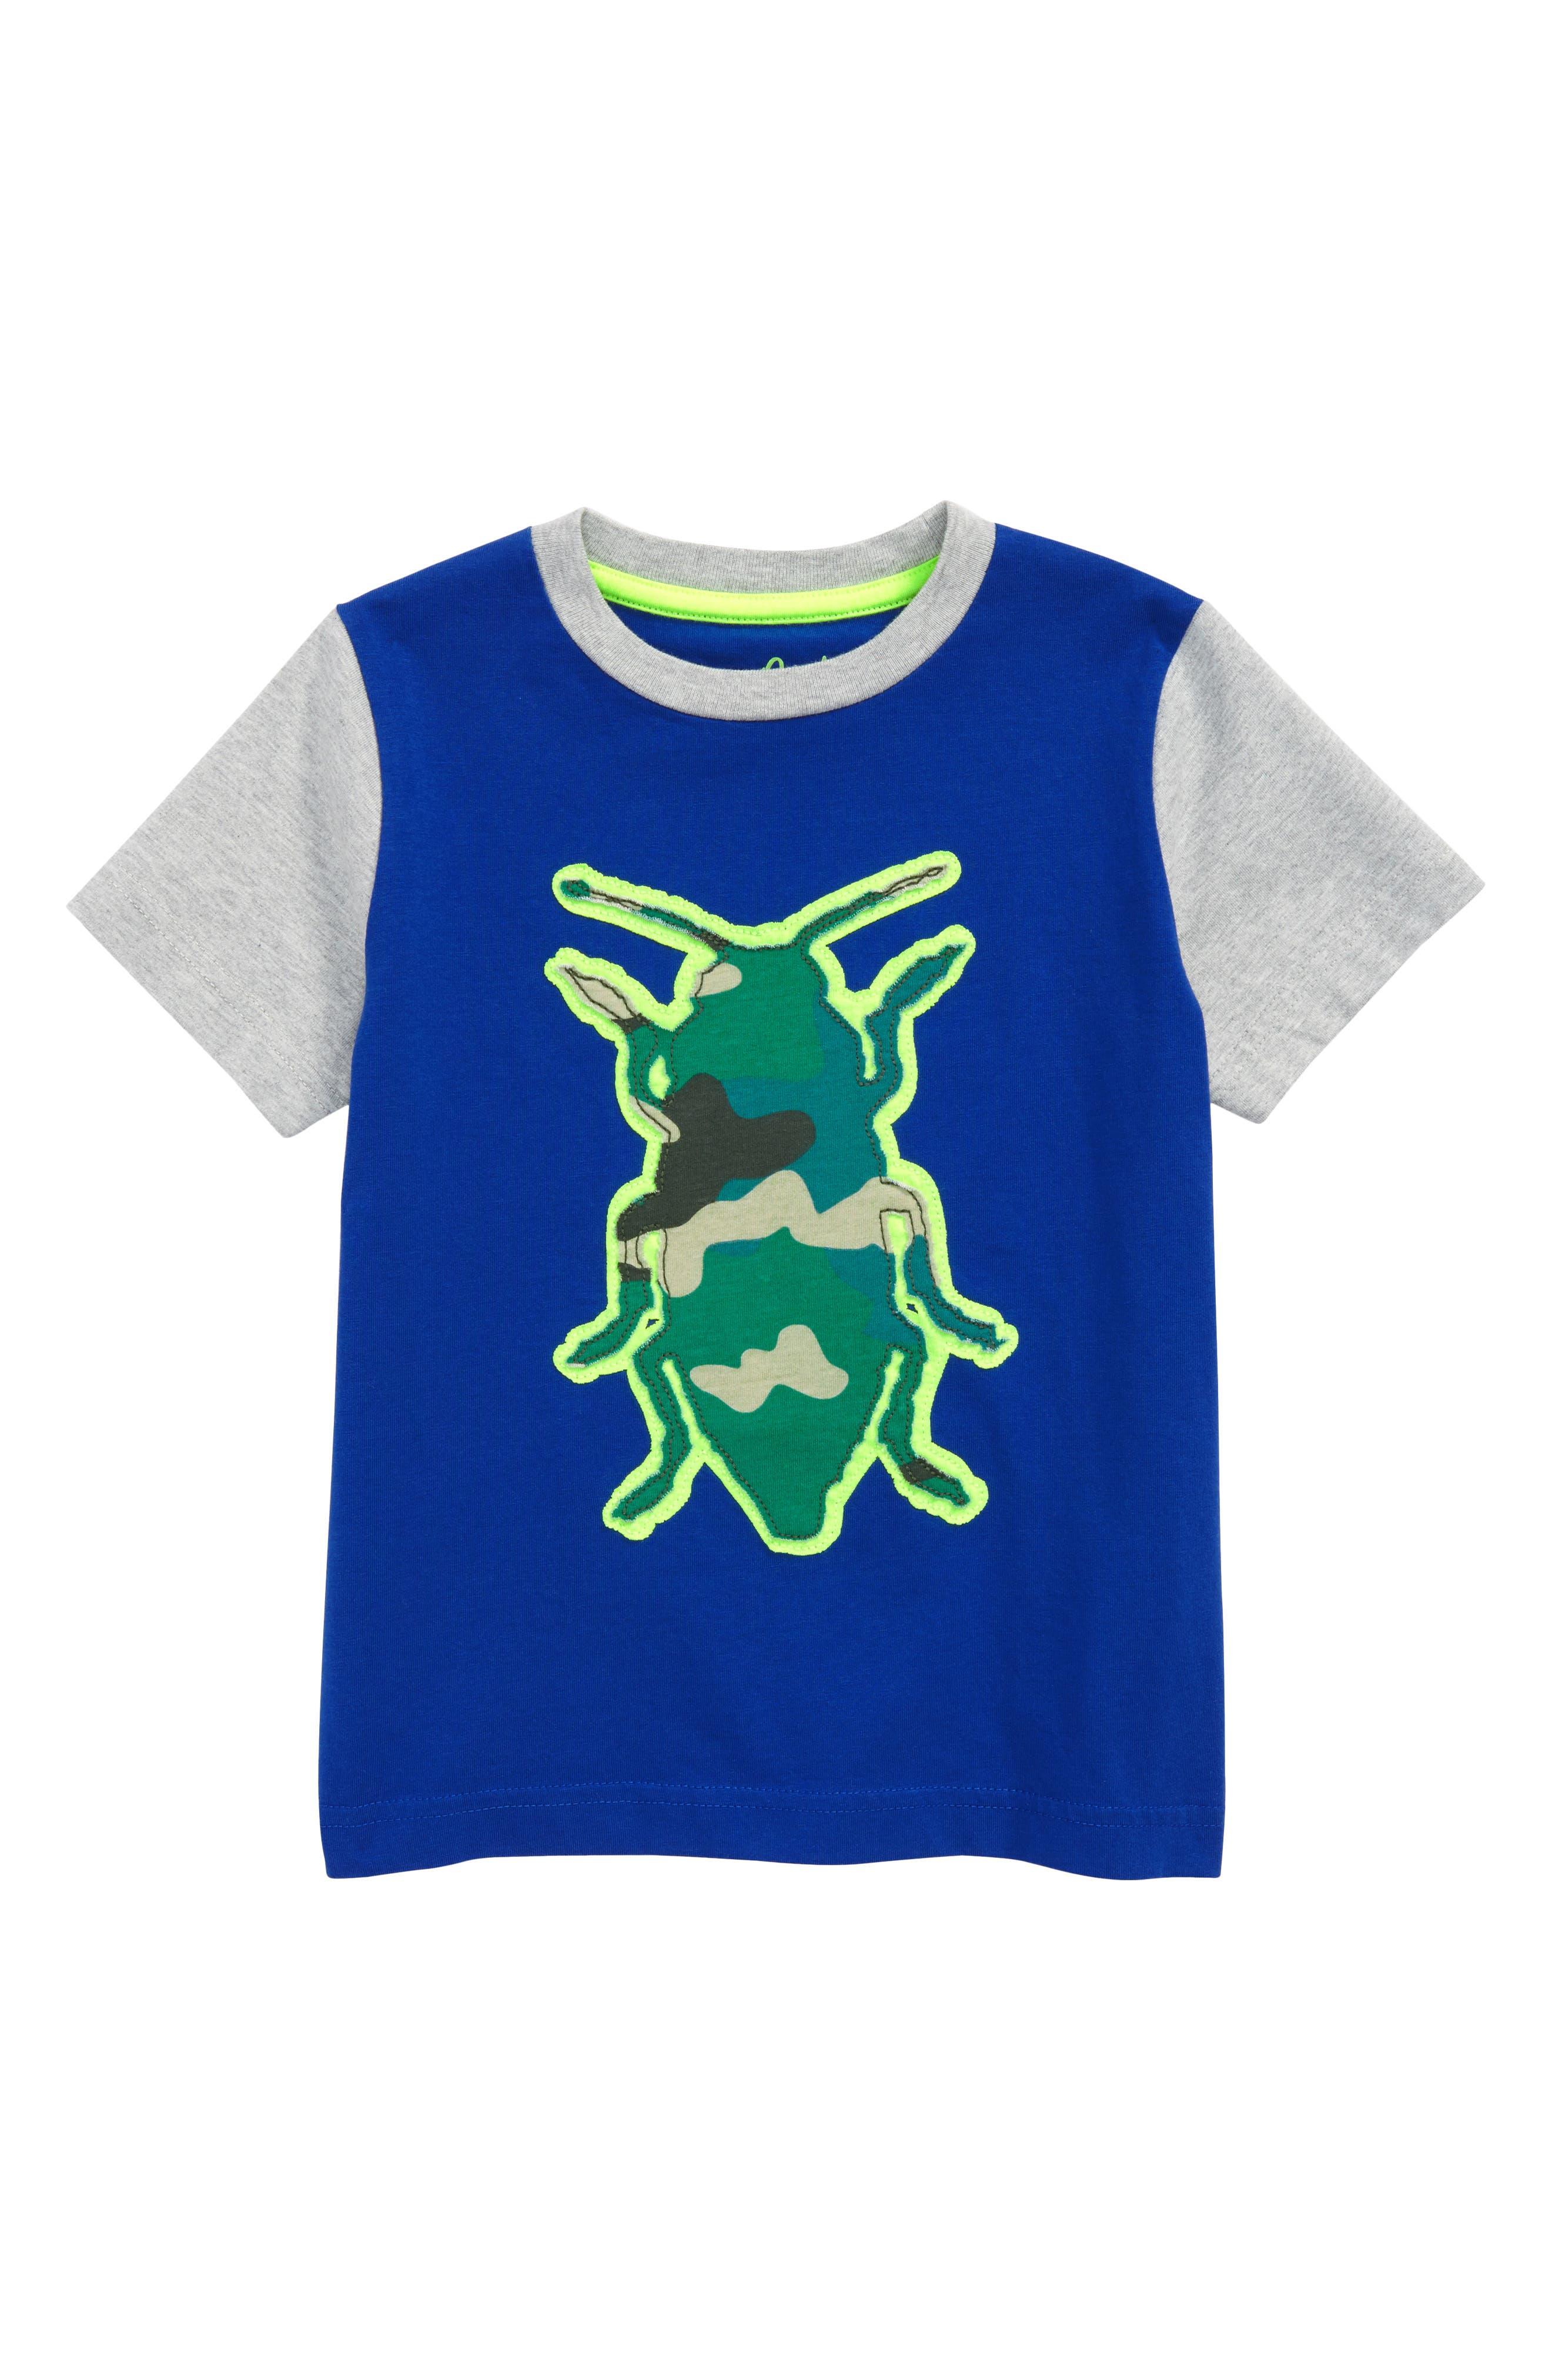 Main Image - Mini Boden Beetle Patchwork T-Shirt (Toddler Boys, Little Boys & Big Boys)